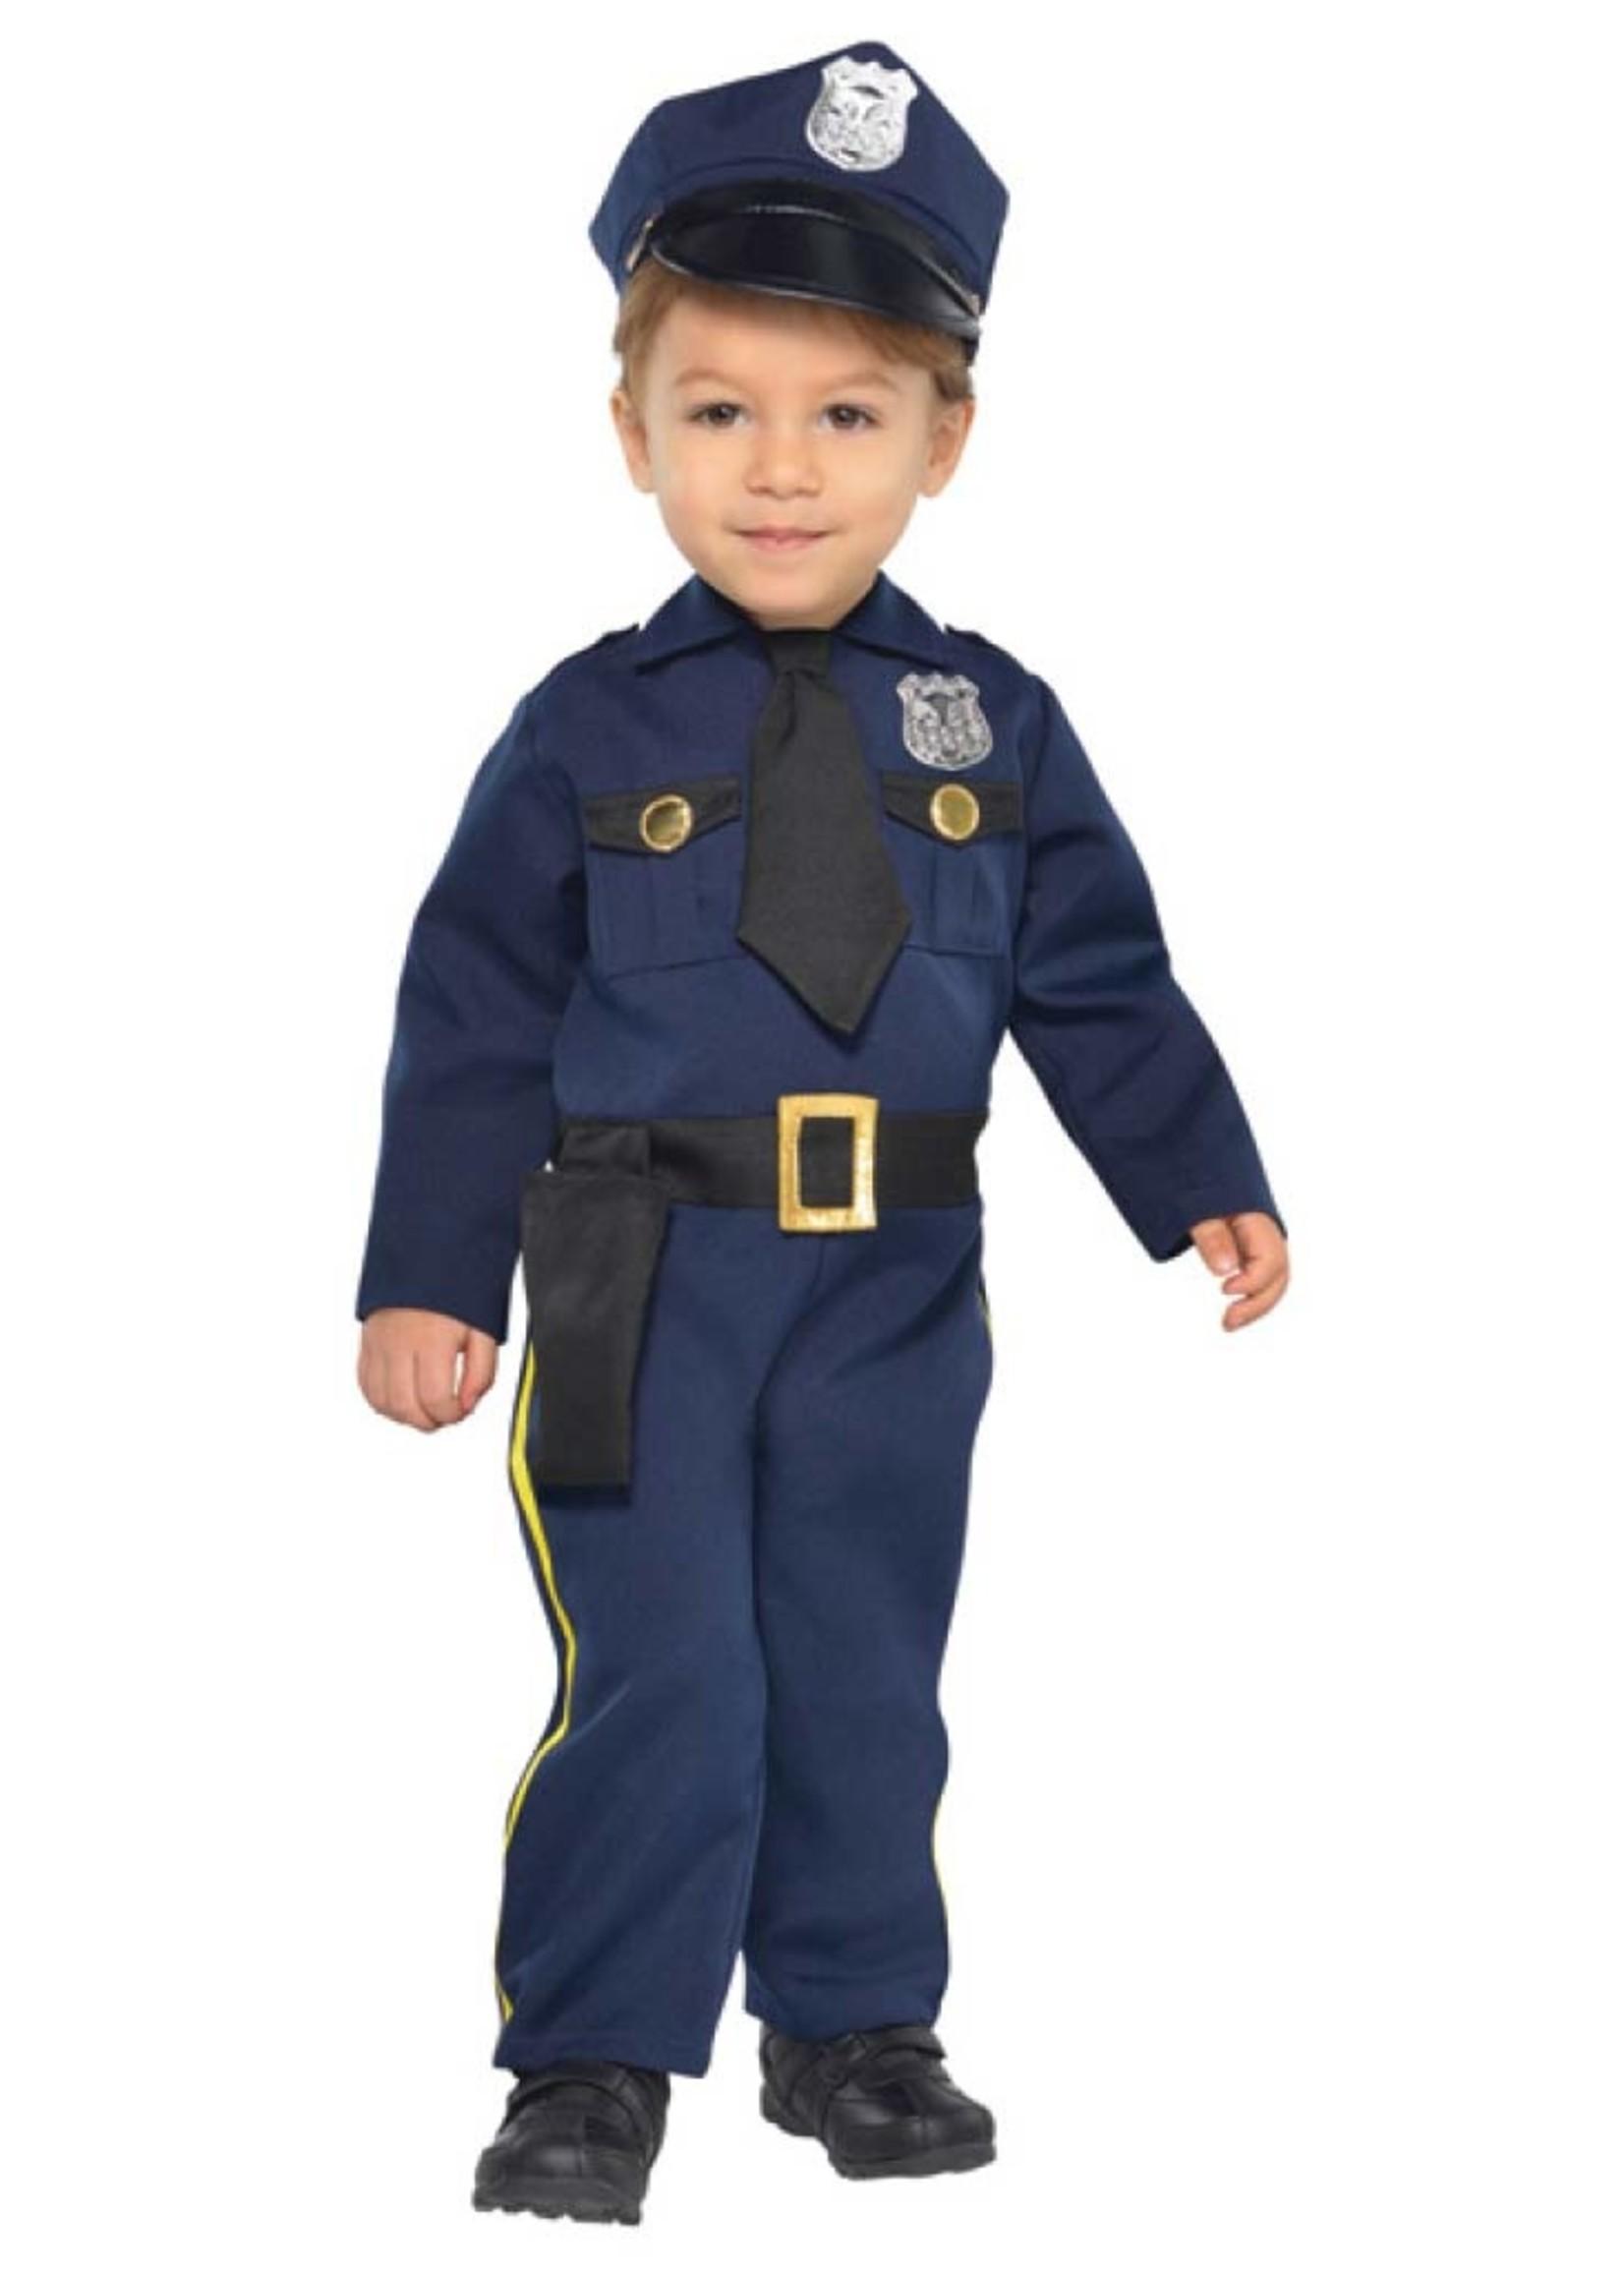 Cop Recruit - Infant